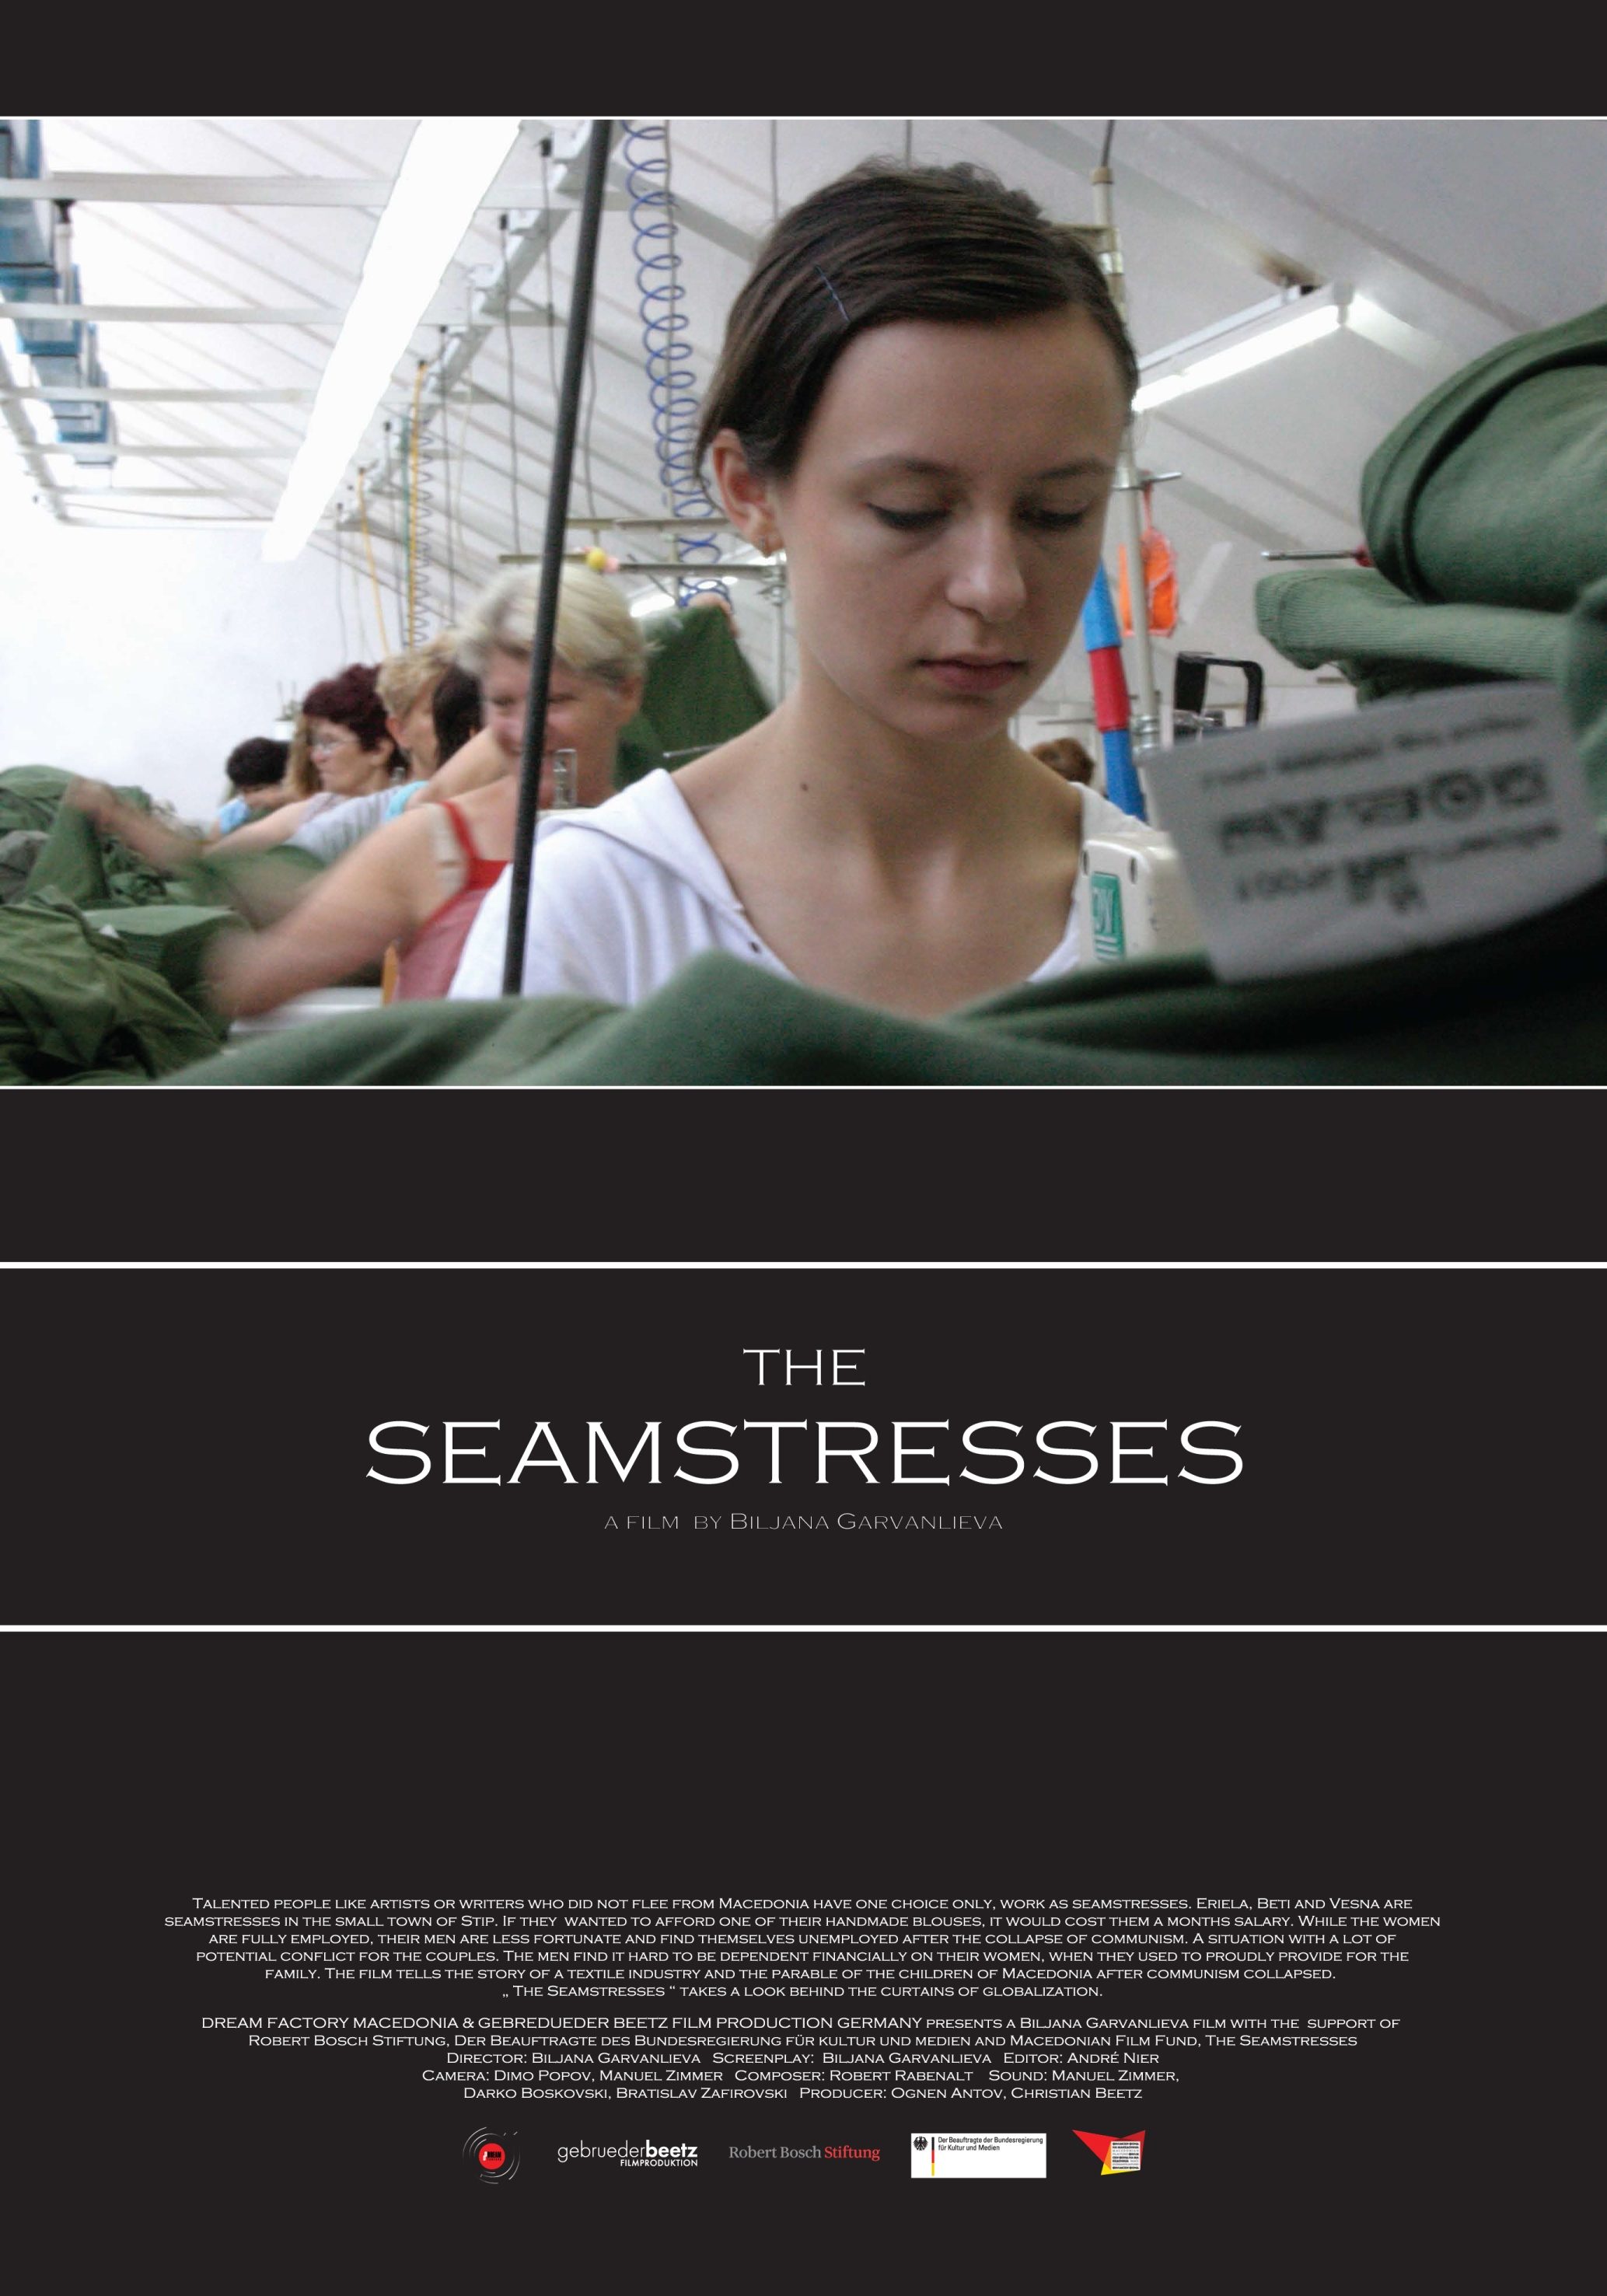 seamstresses-poster1.jpg